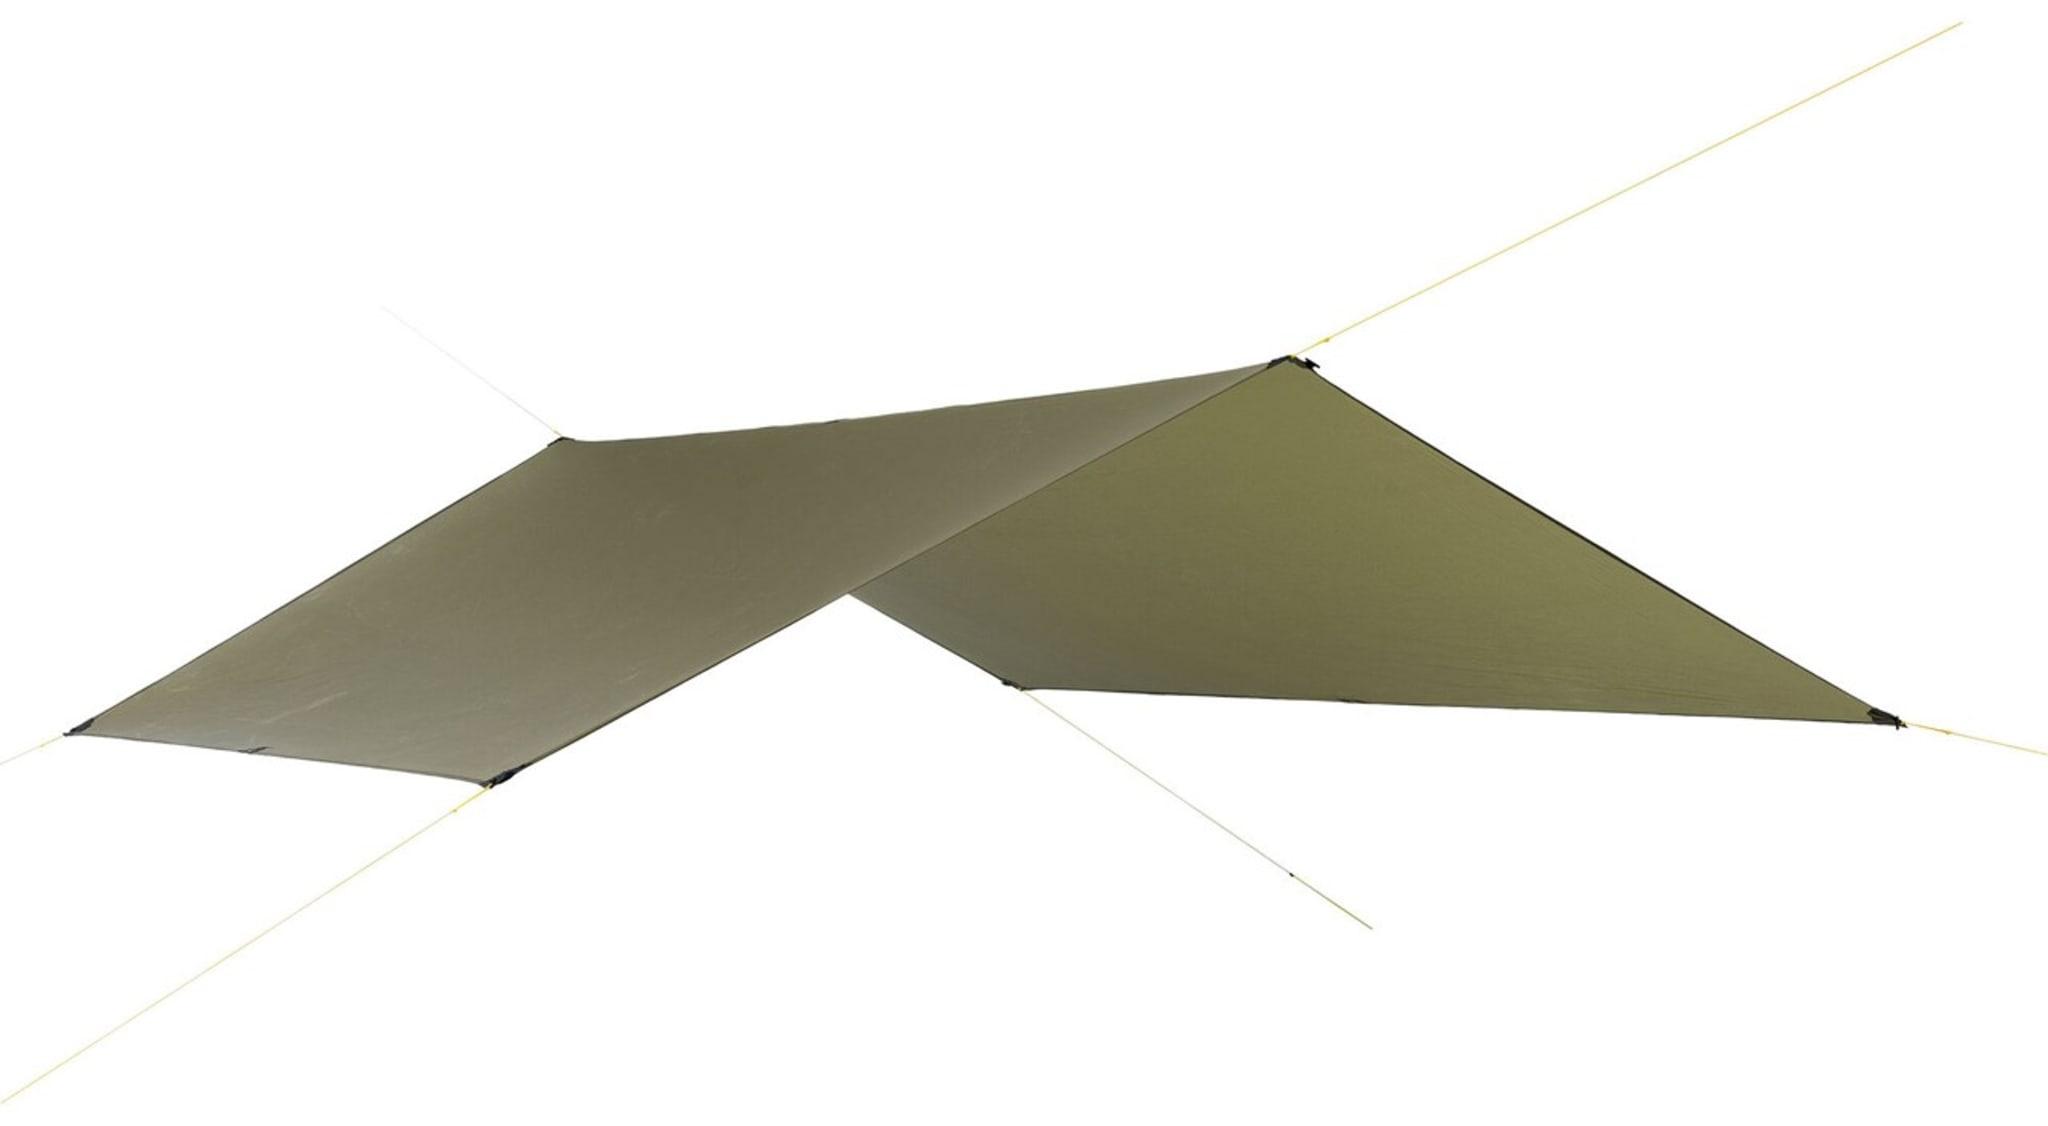 Fleksibelt og effektivt ly for vær og vind